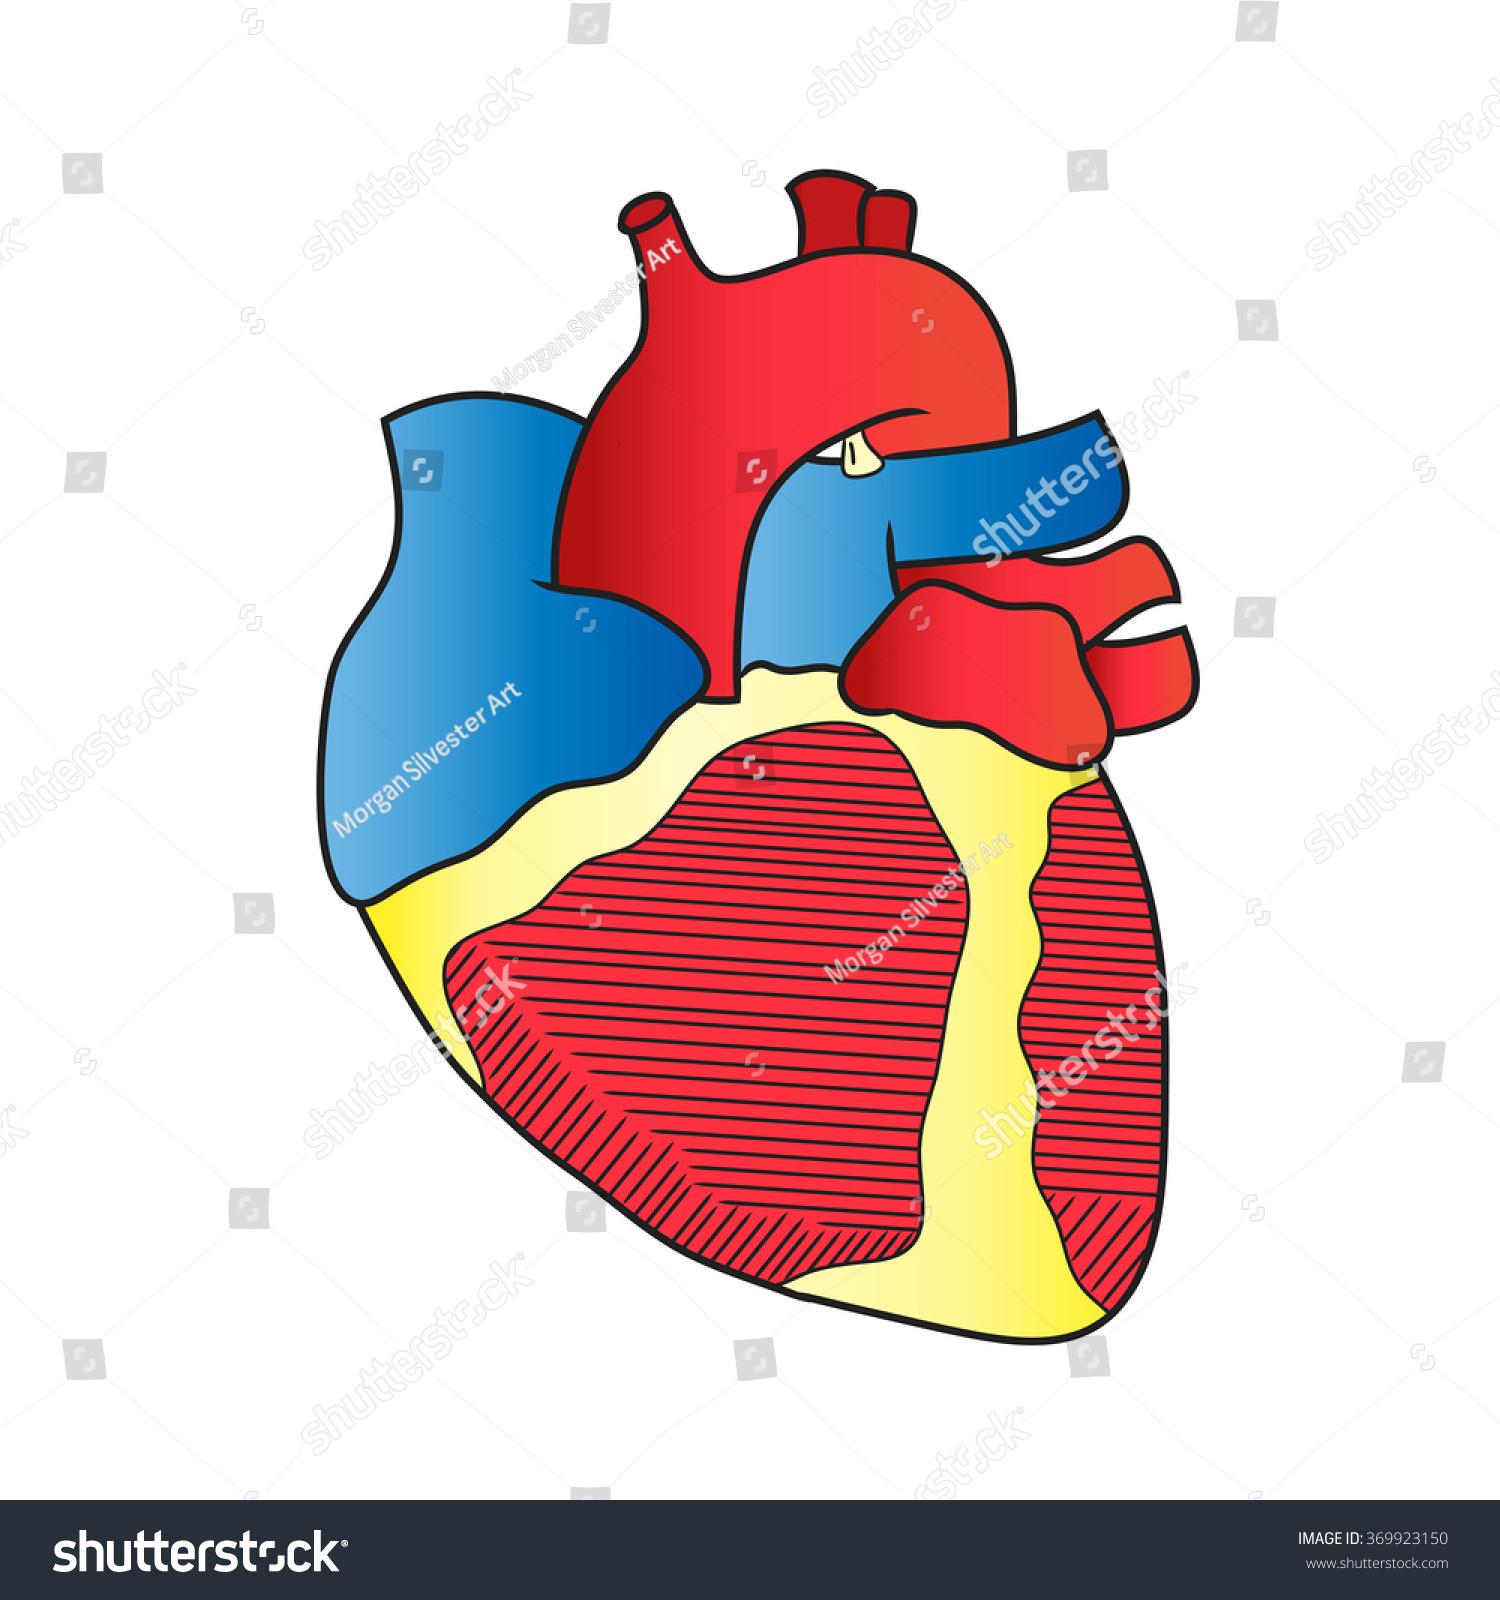 Anatomy Heart Anterior View Isolated Stock Illustration 369923150 ...